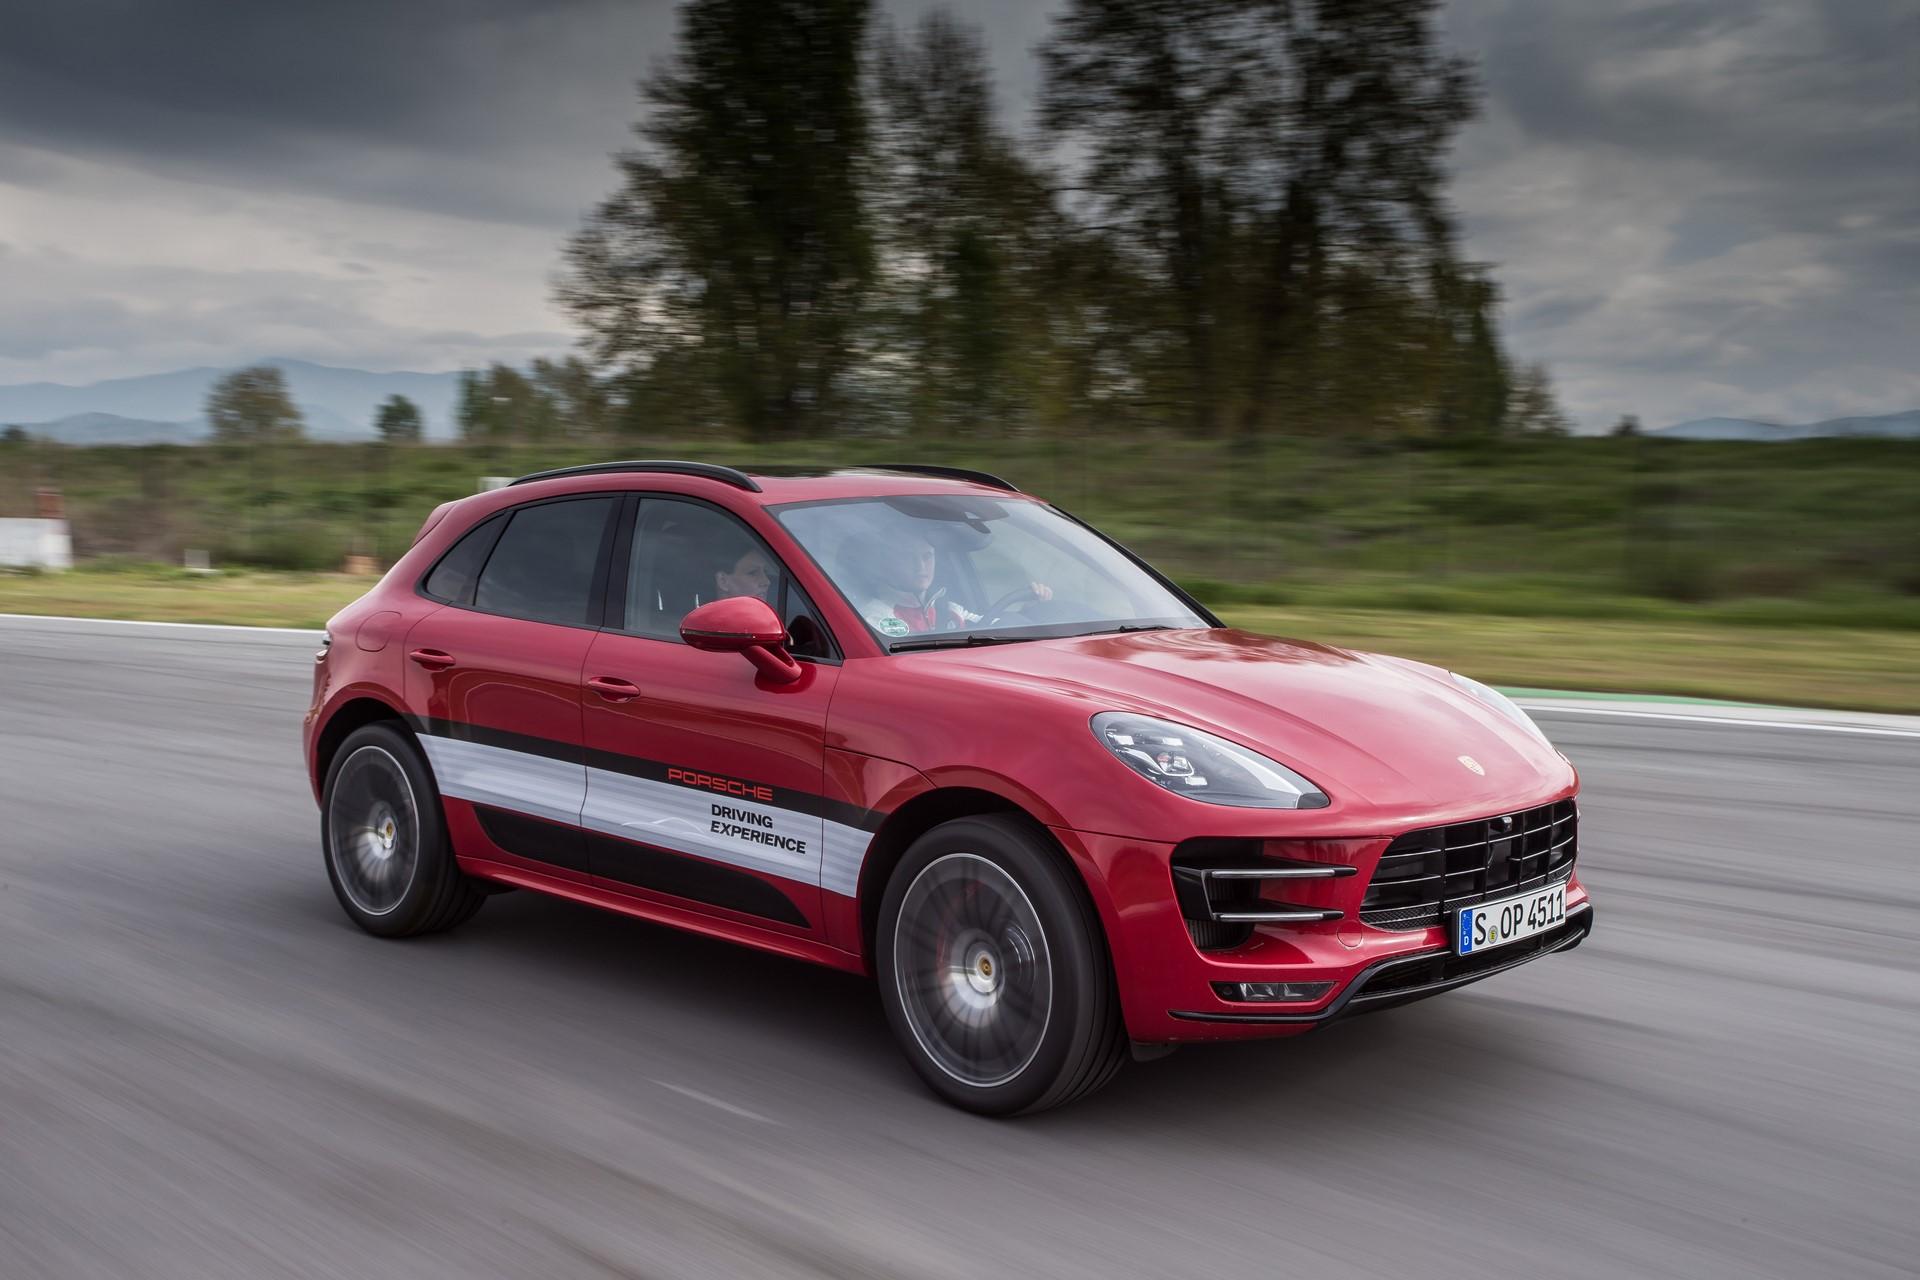 Porsche Driving Experience 2017 Serres (55)